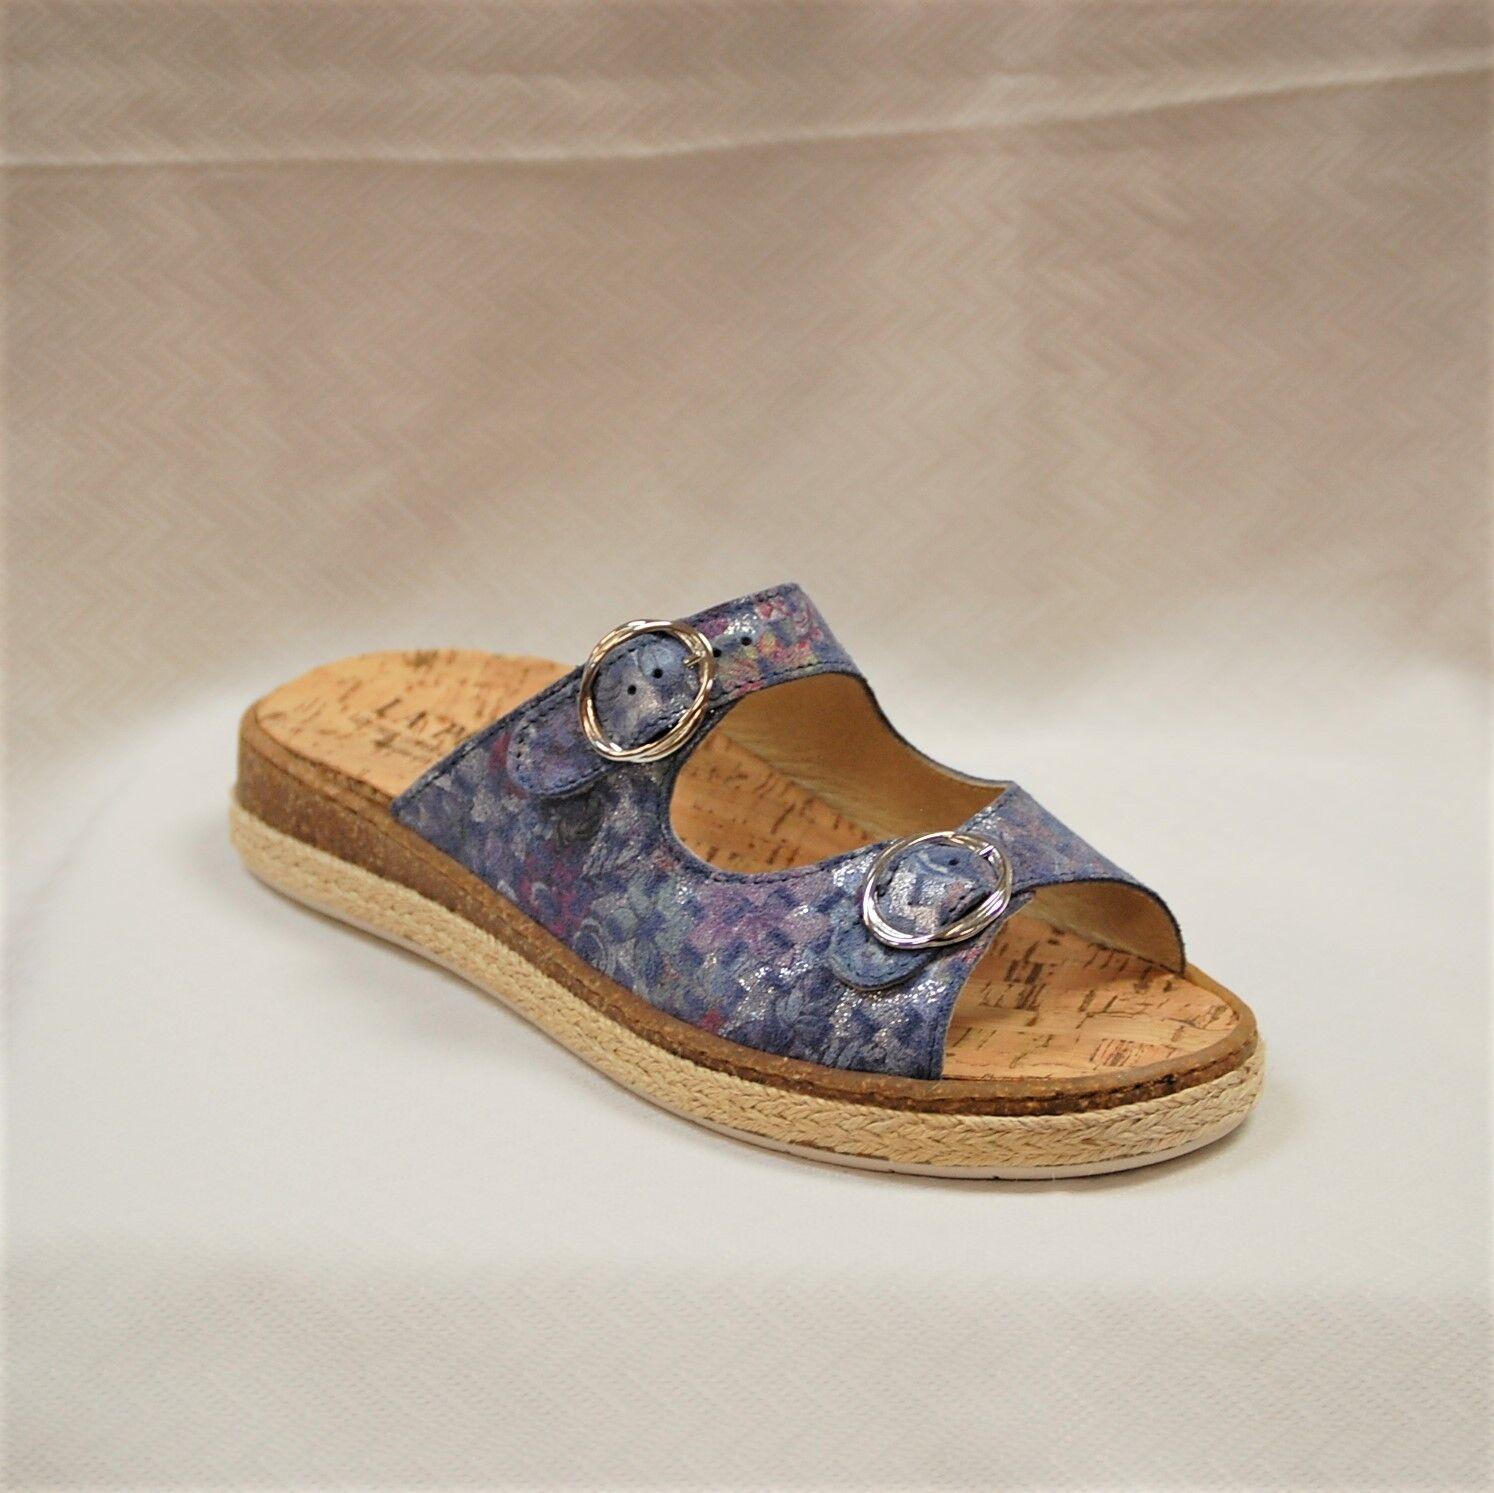 La Plume Jewel bluee Multi  Sandals Sandals Sandals Leather Womens Slide shoes Low Heel size 41 2b951e